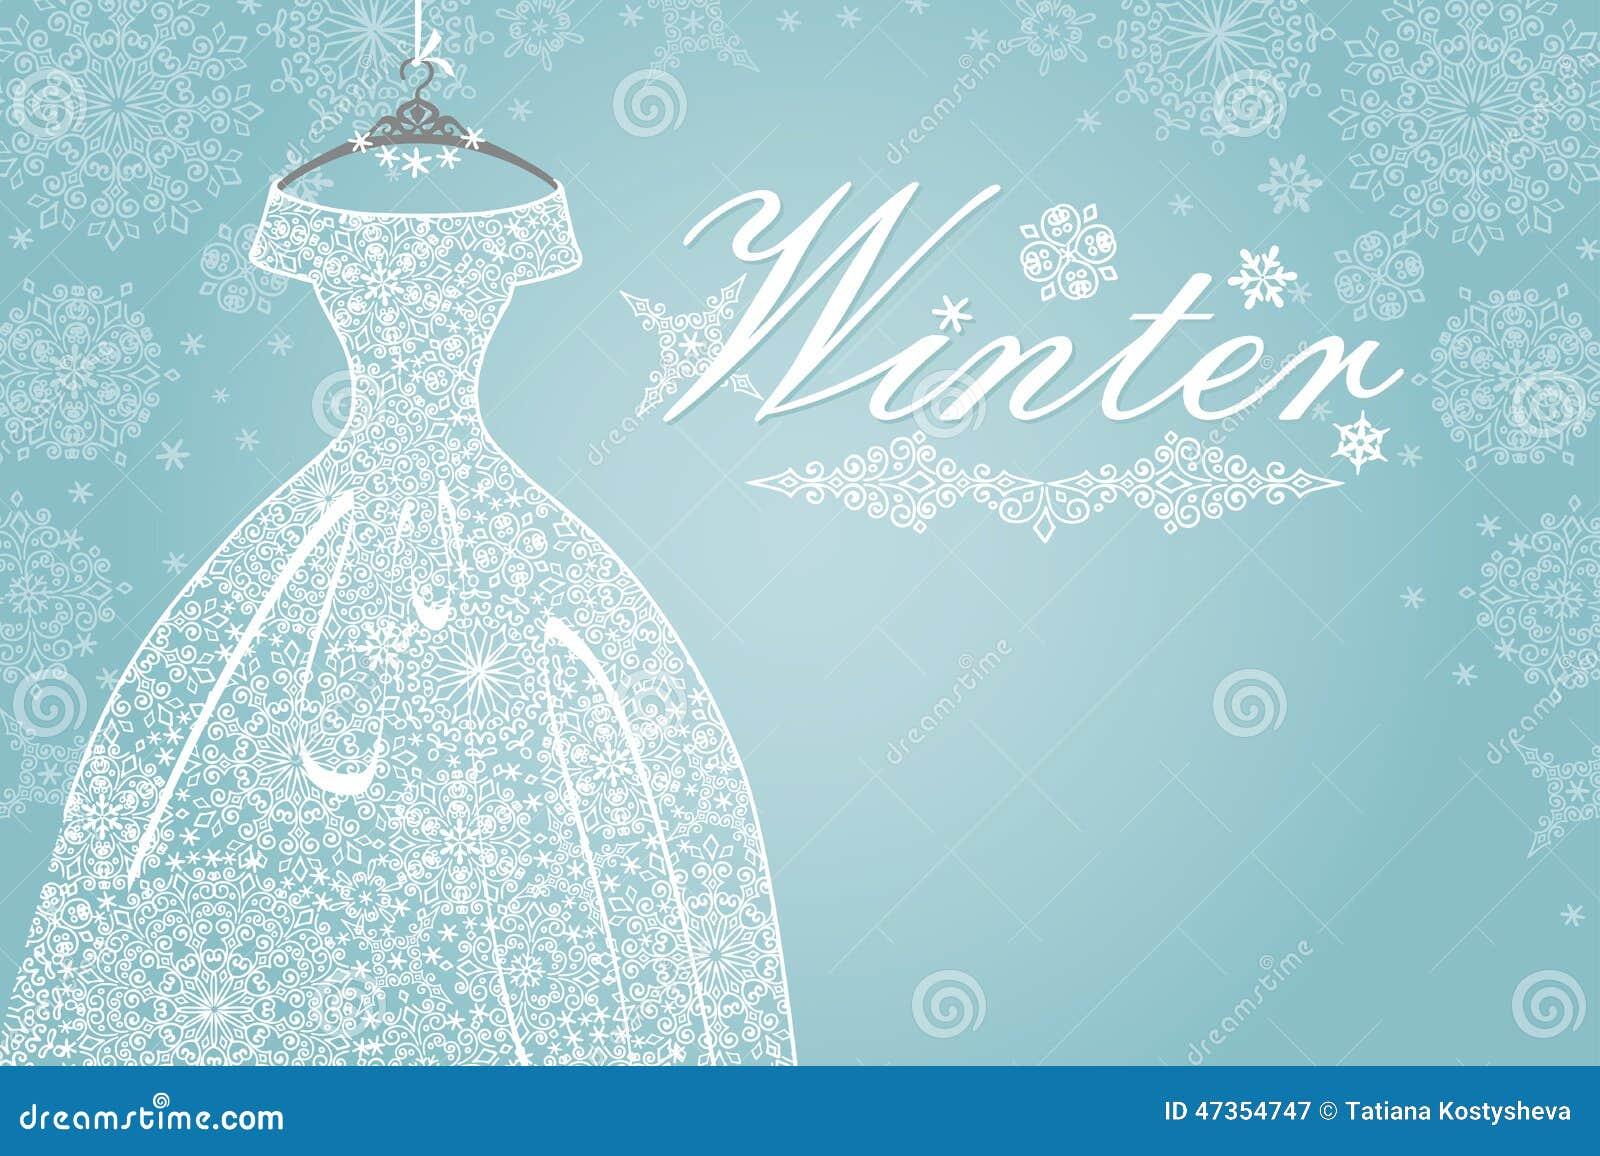 Winter Wonderland Wedding Invitation is Fresh Layout To Make Awesome Invitations Design